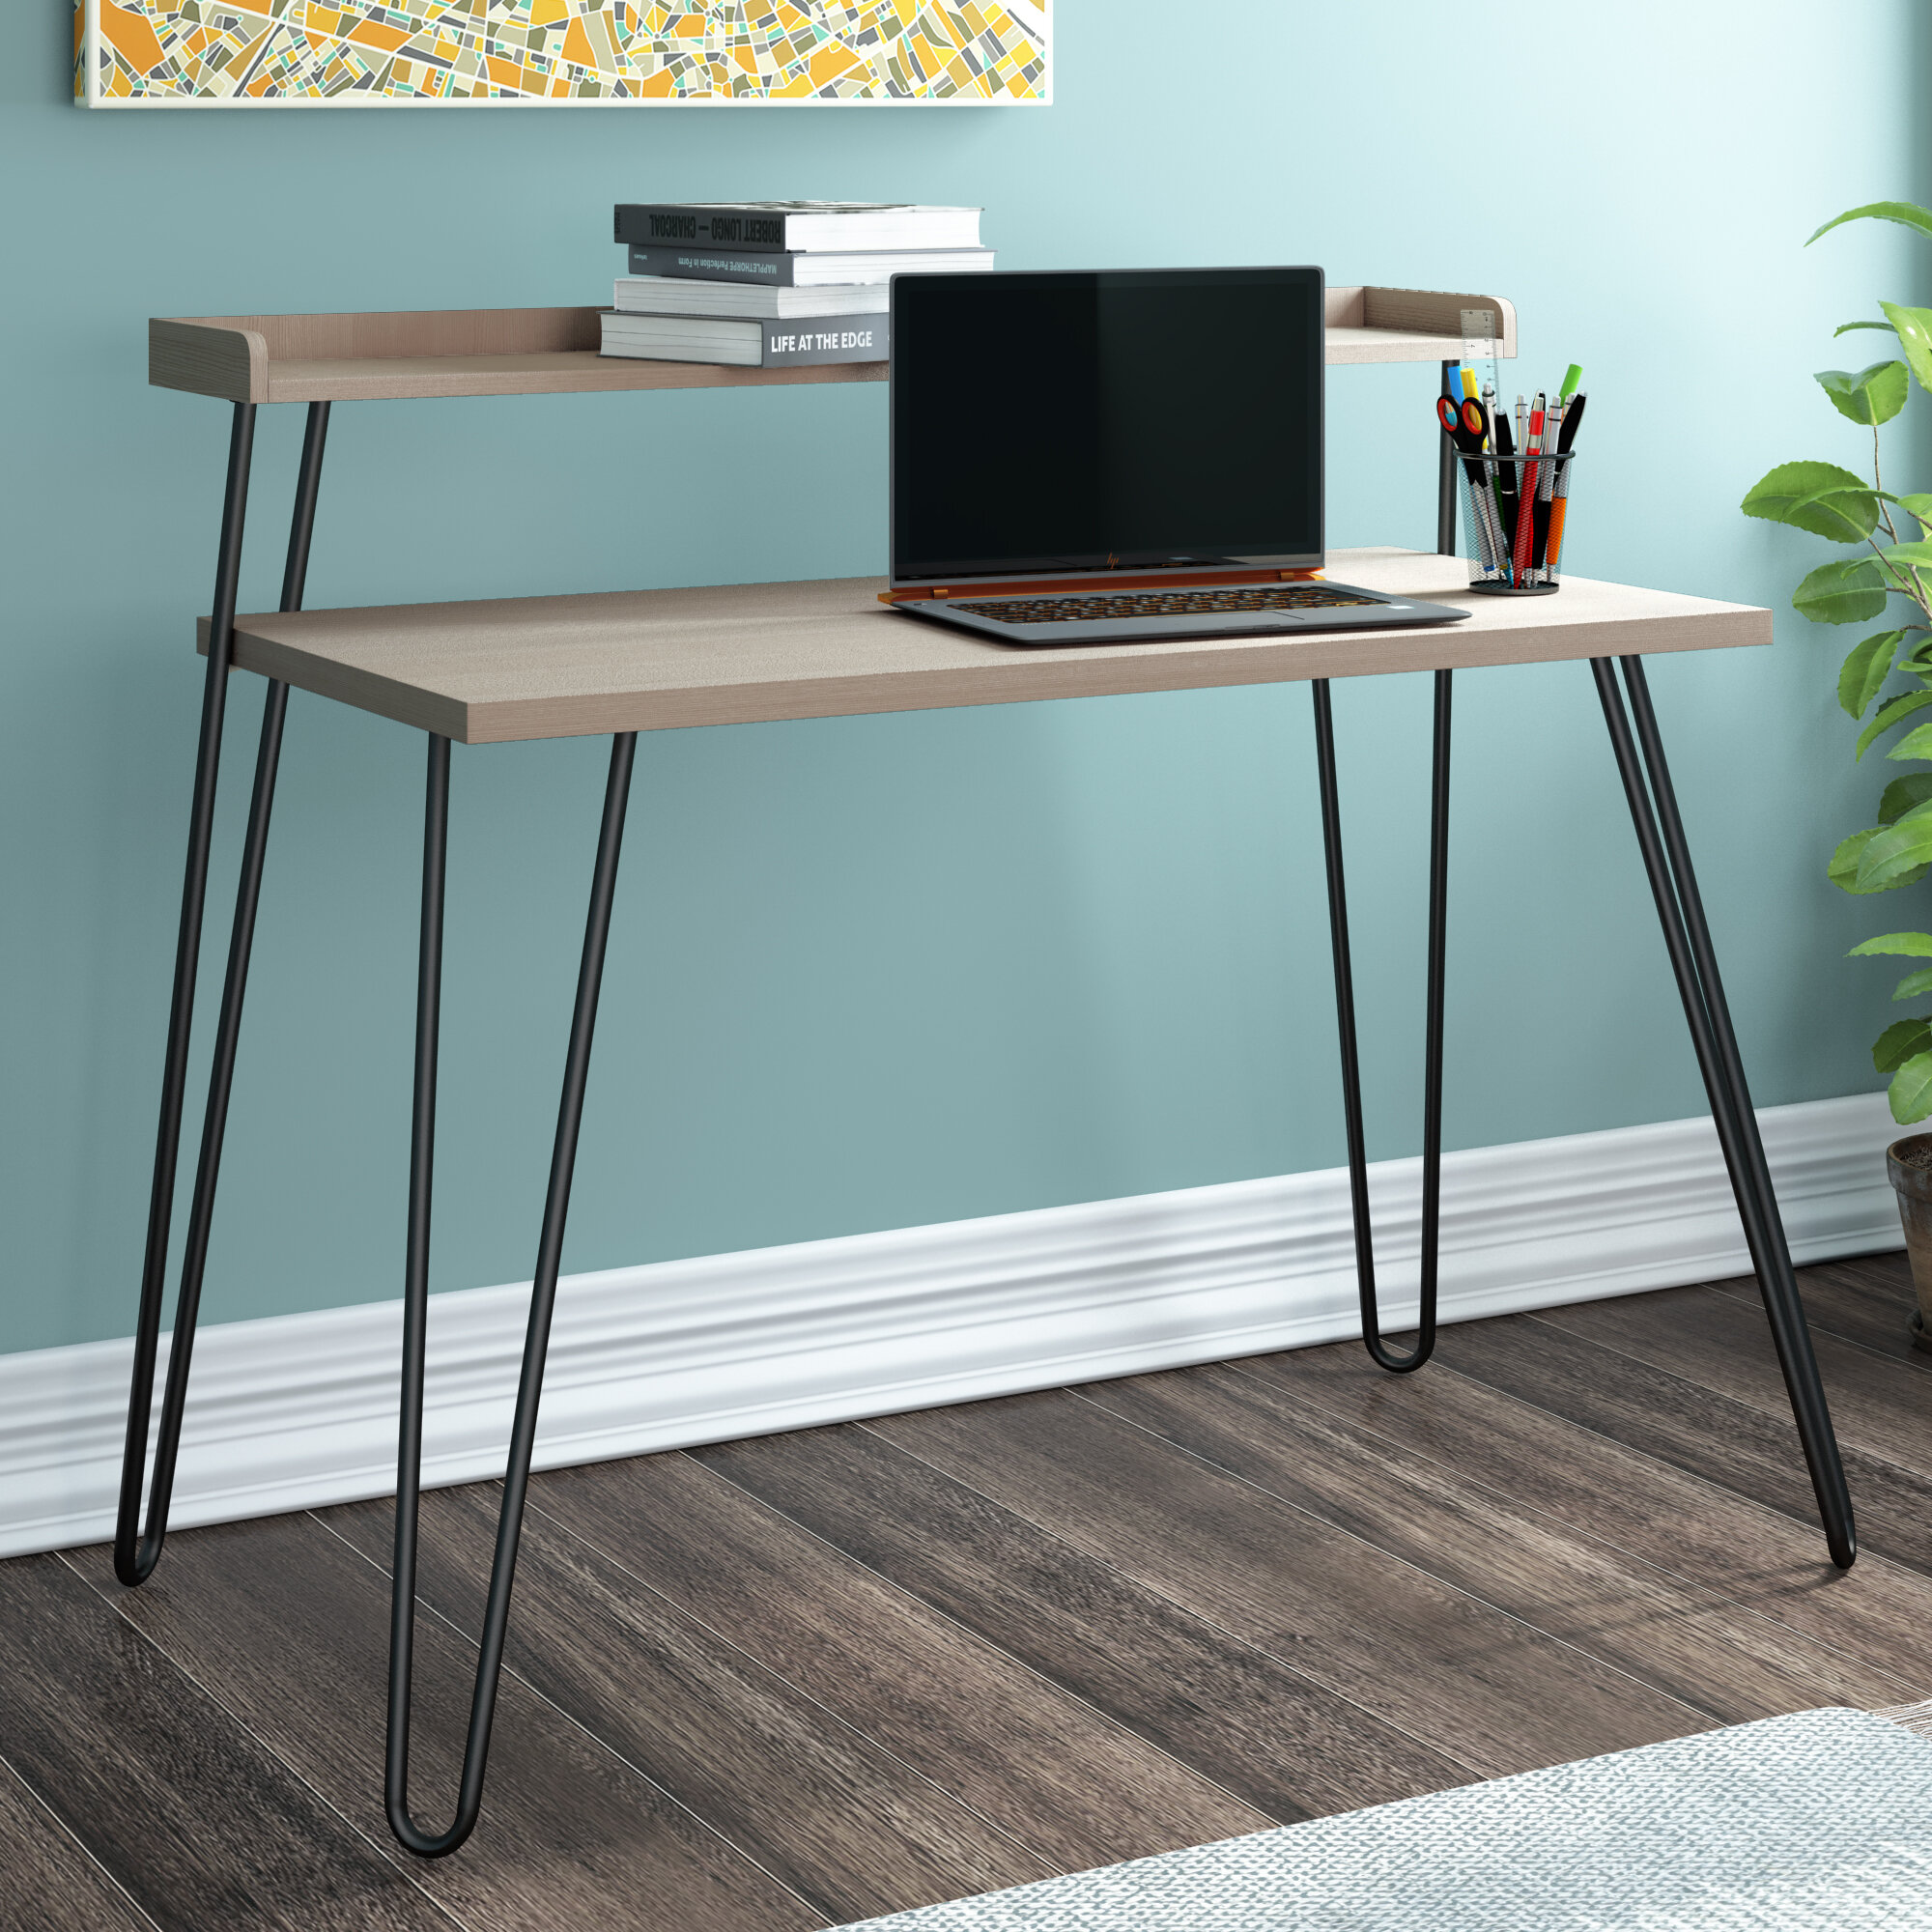 Mid Century Modern Desks You Ll Love In 2020 Wayfair